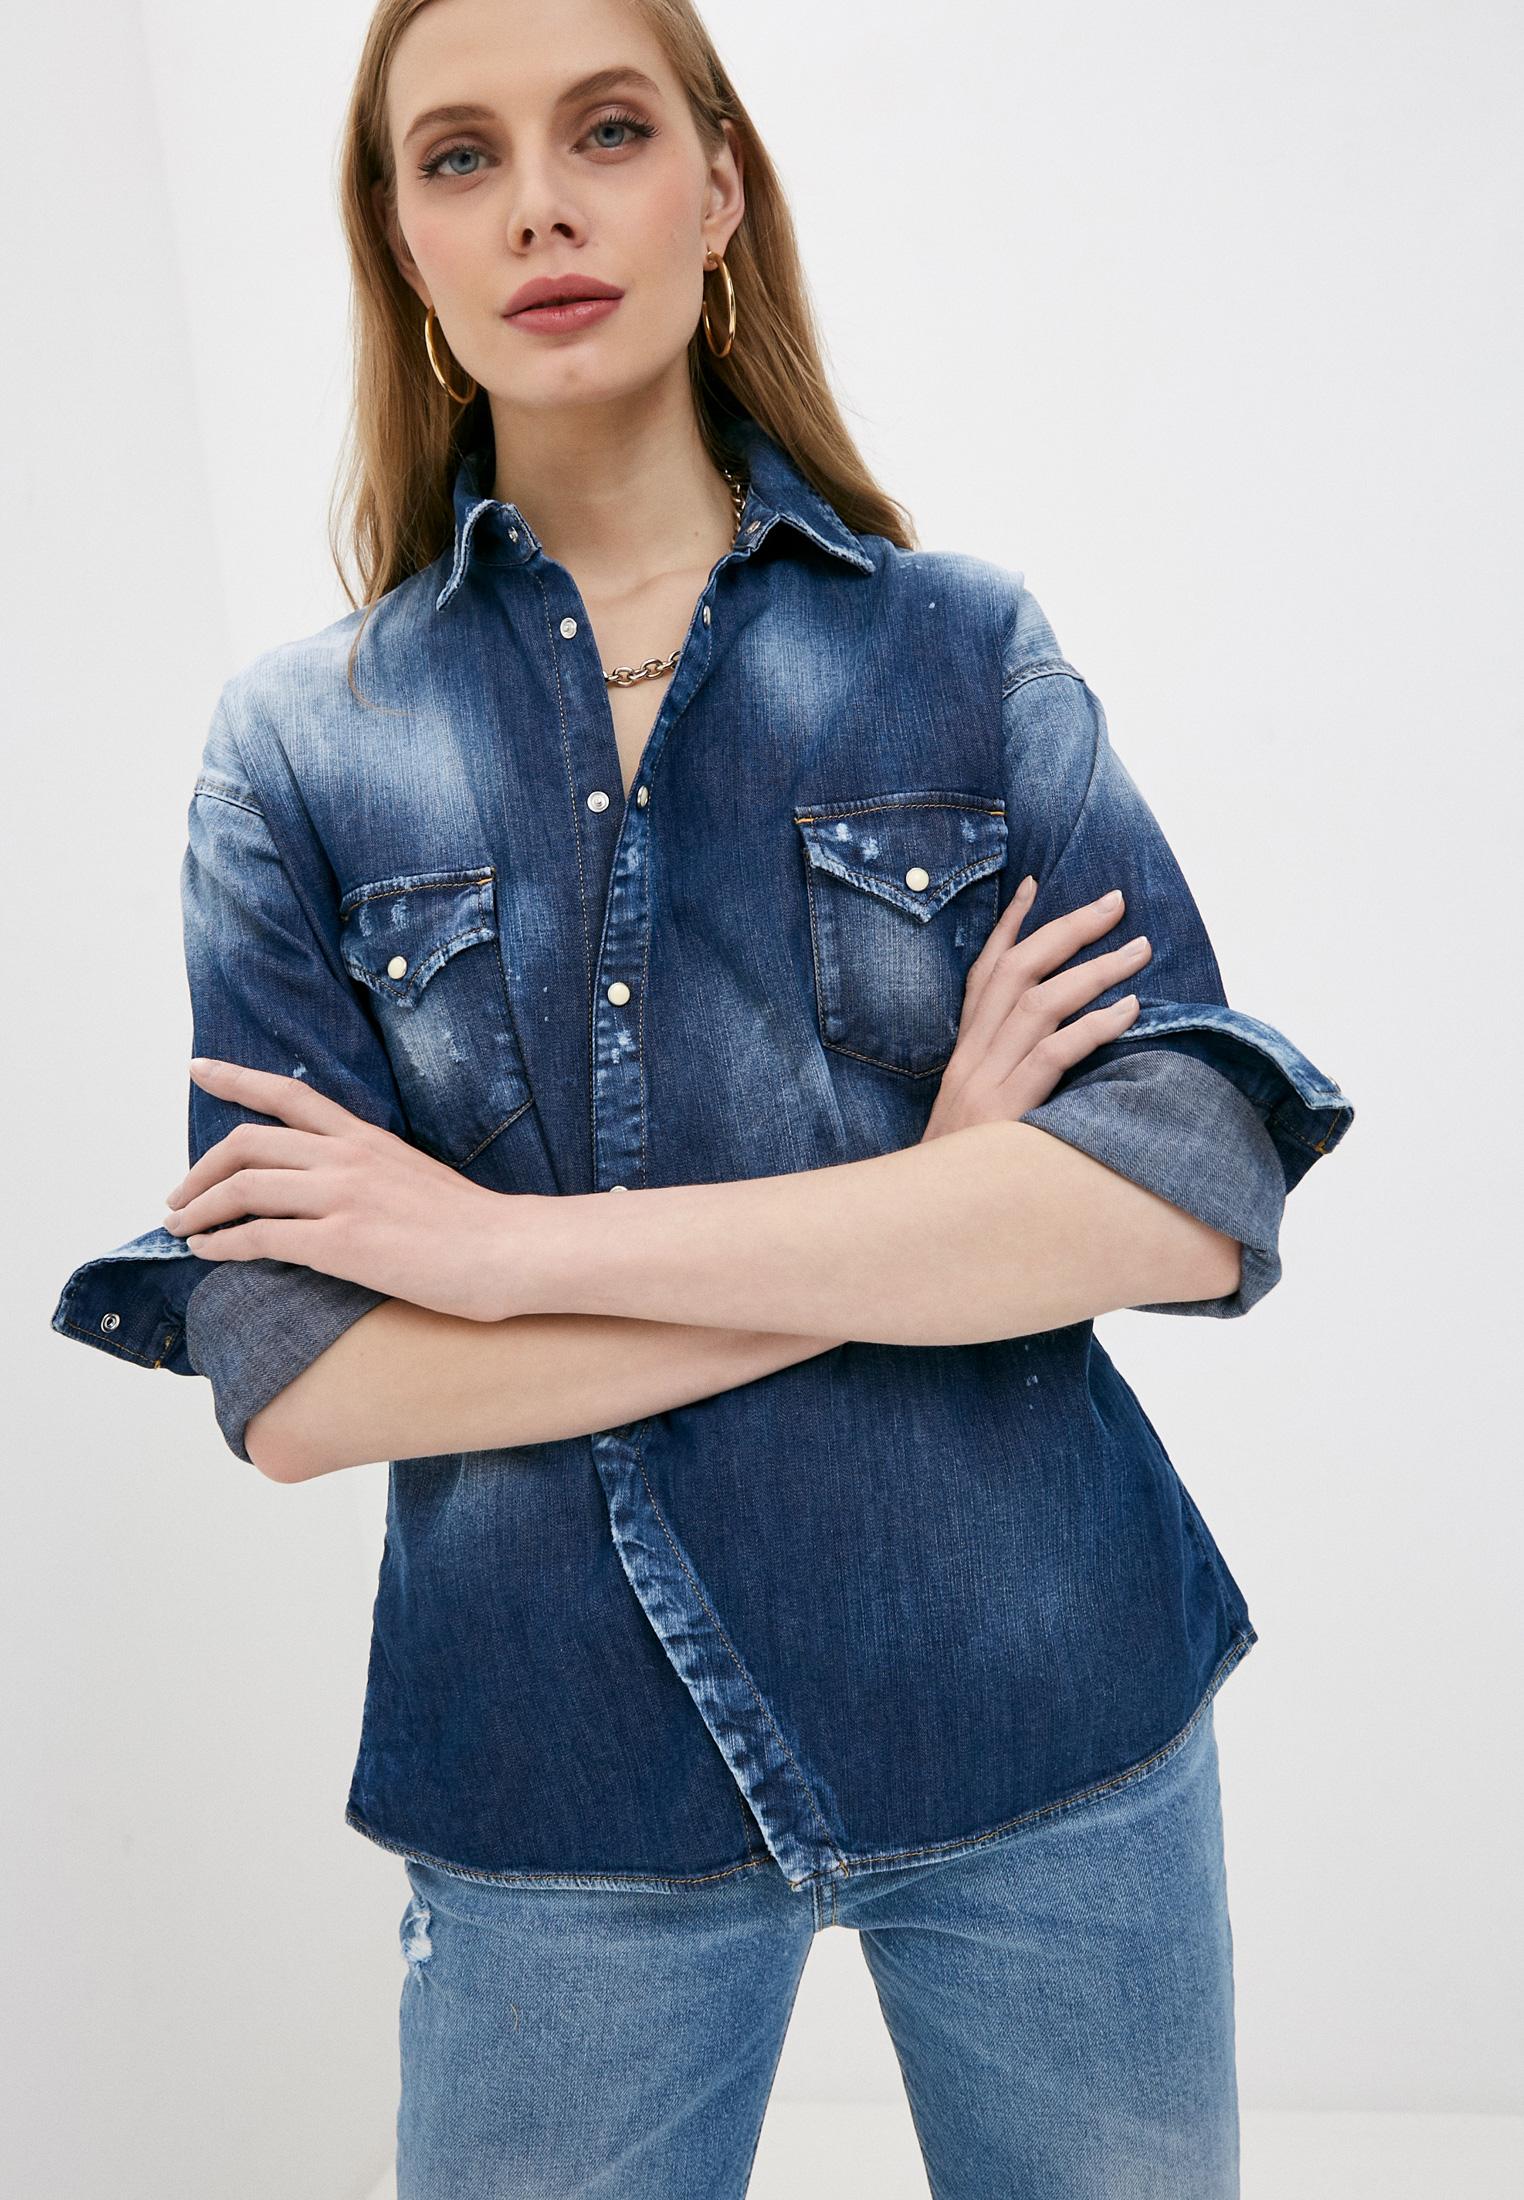 Женские джинсовые рубашки DSquared2 Рубашка джинсовая Dsquared2